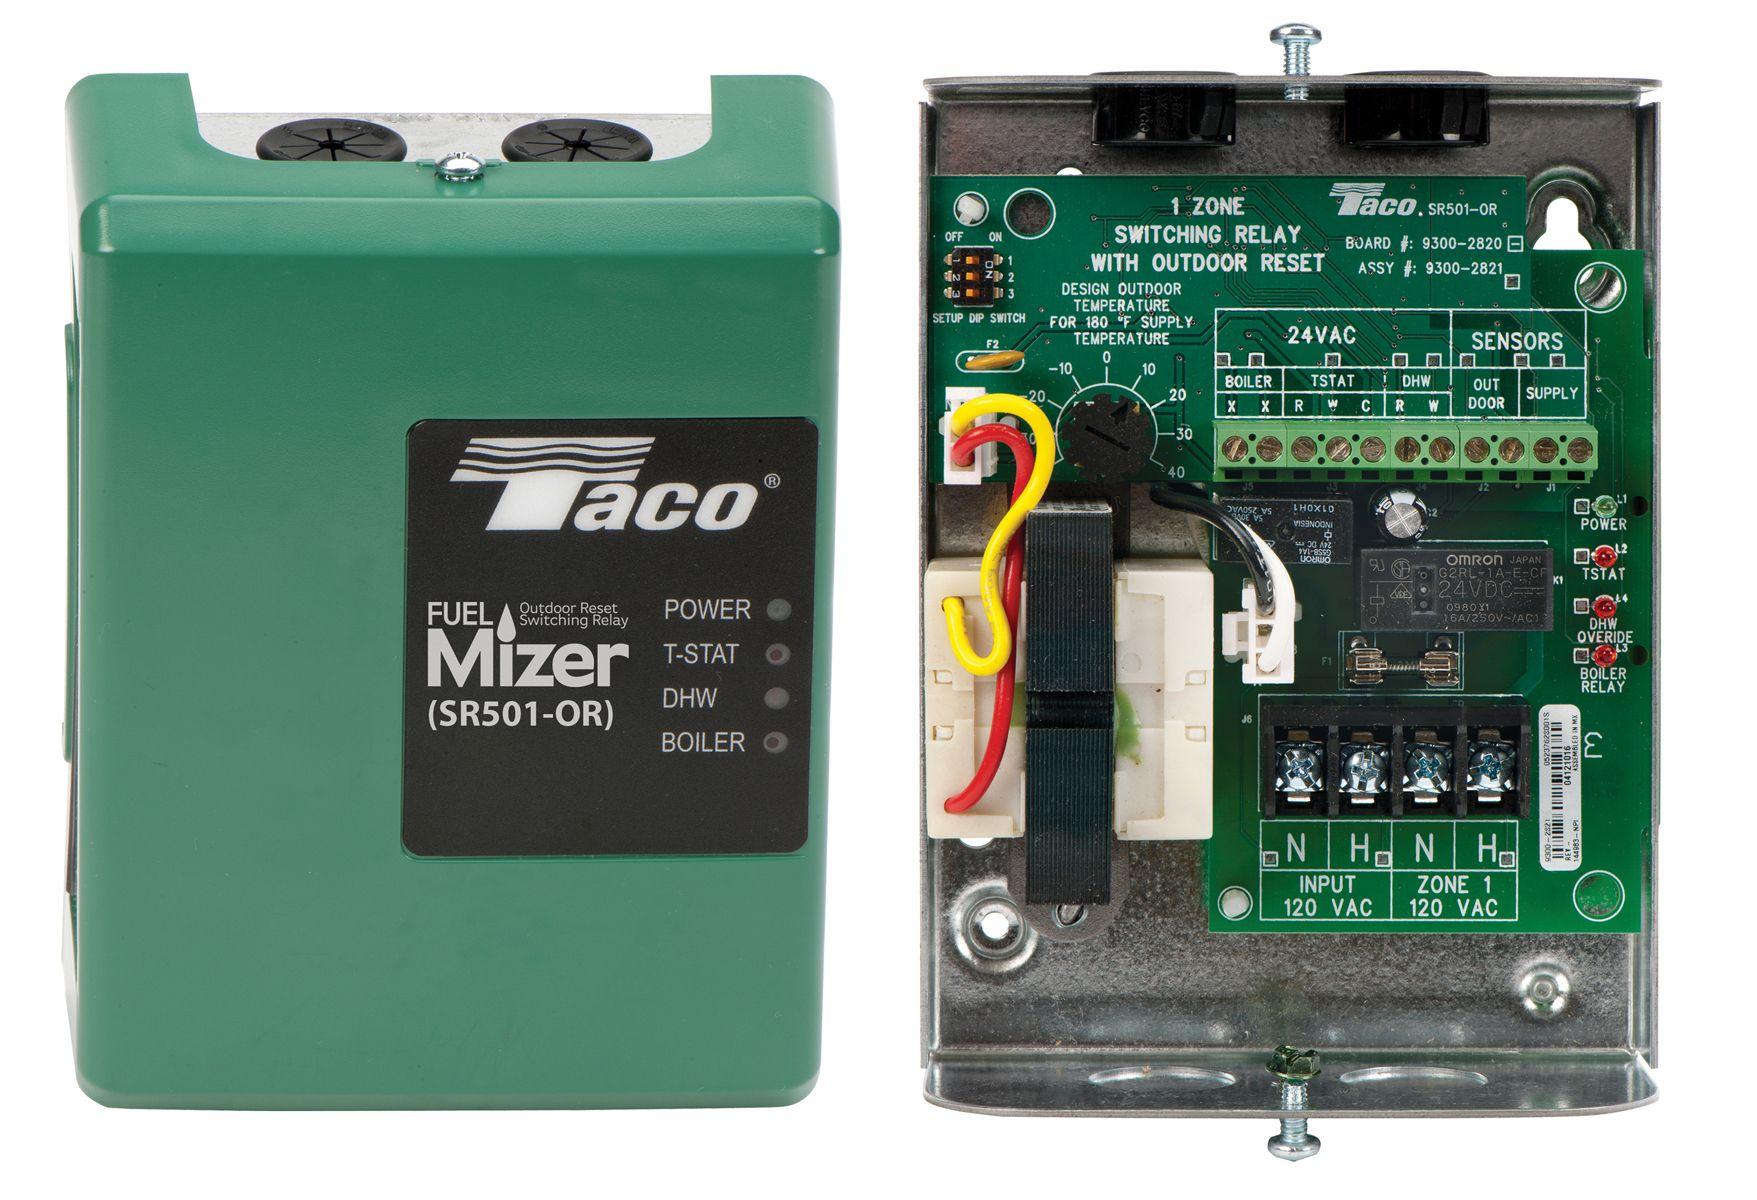 FuelMizer_OutsideInside Hvac, Electronic products, Boiler